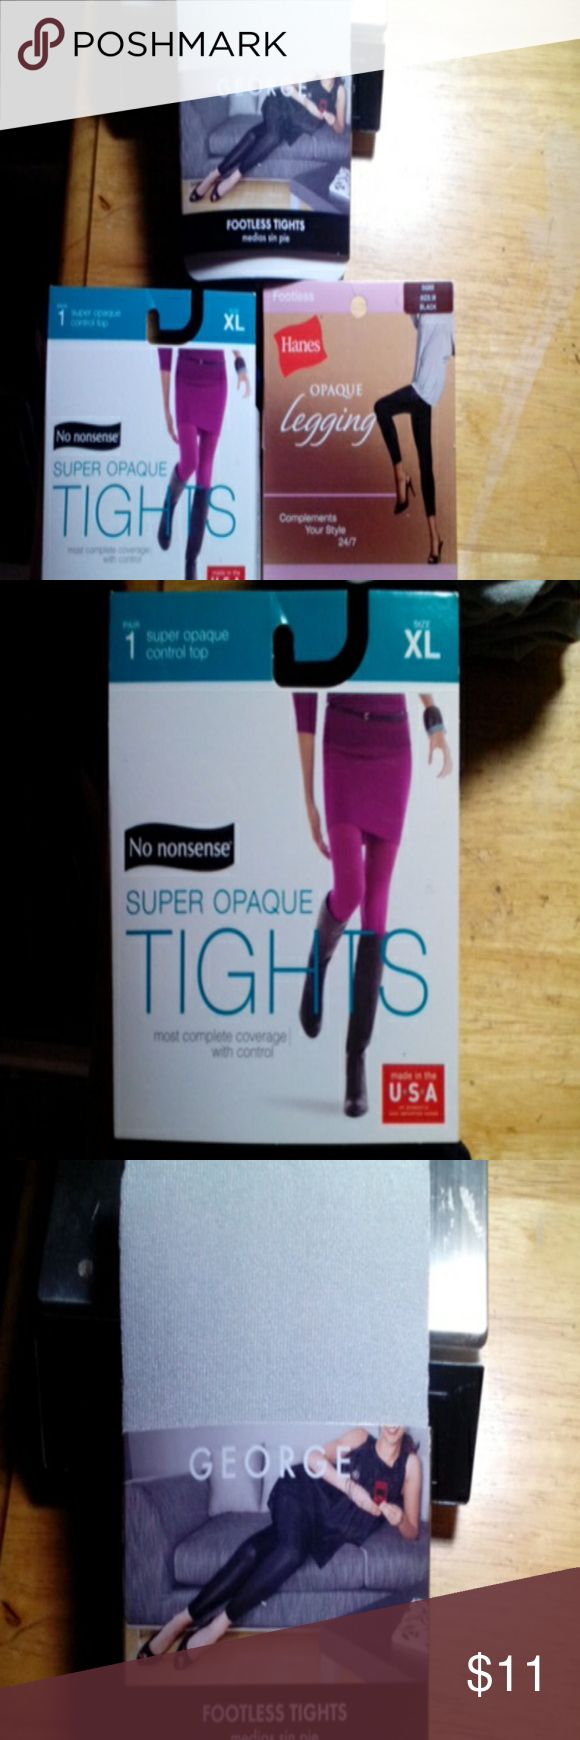 Bundle of leg wear Grey tights medium, black footless legging medium, and navy tights Accessories Hosiery & Socks